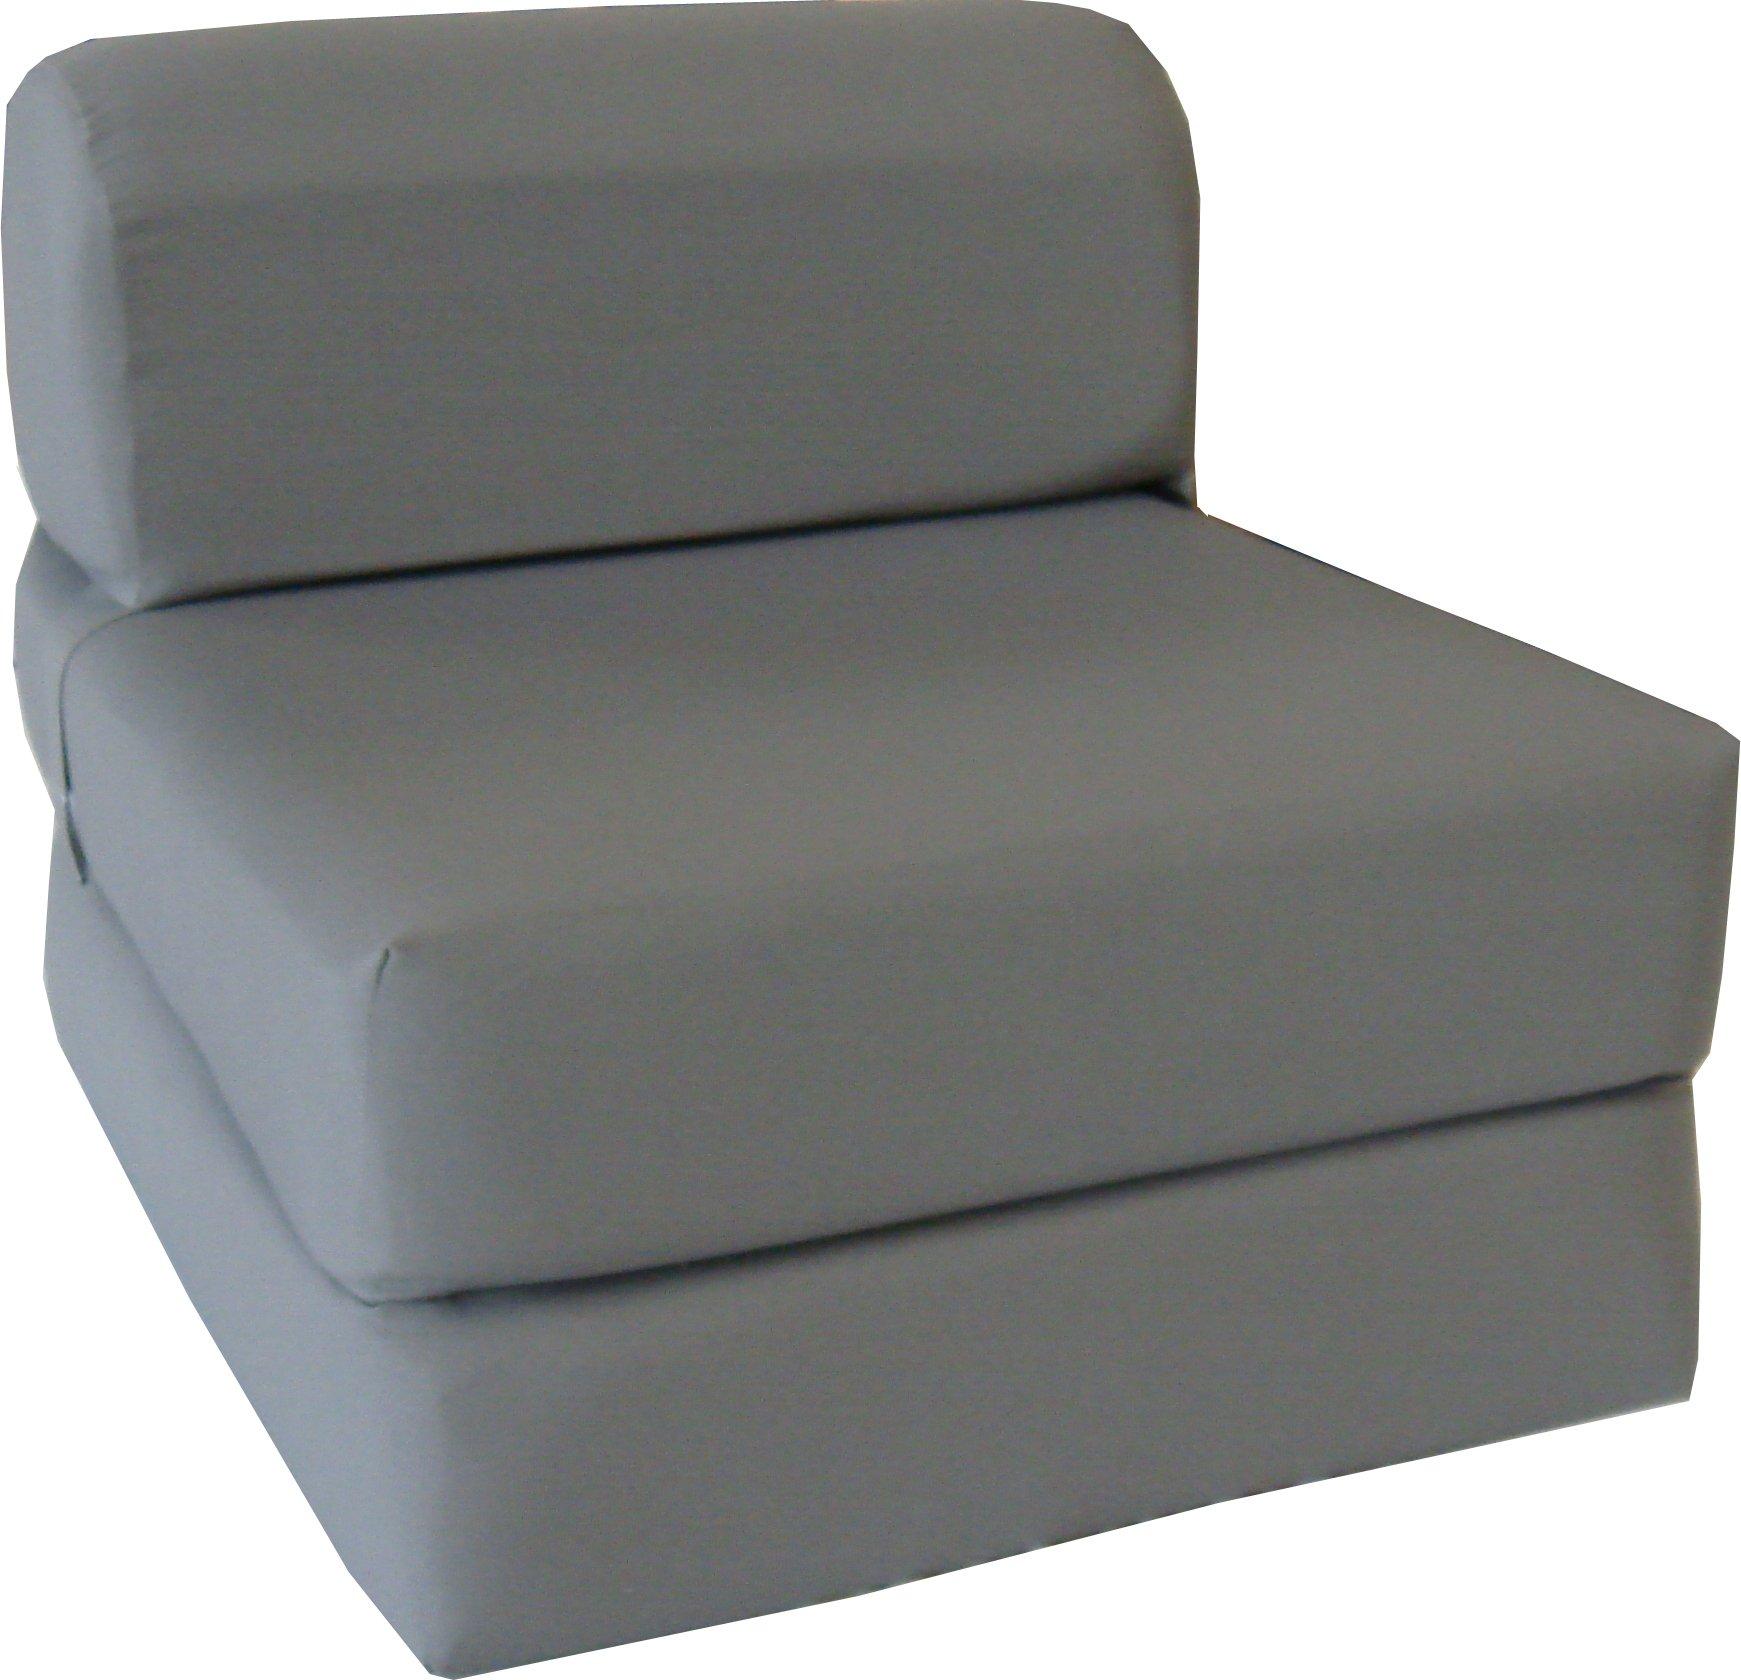 Chair Folding Foam Bed, Studio Sofa Guest Folded Foam Mattress (6'' x 32'' x 70'', Gray) by D&D Futon Furniture.